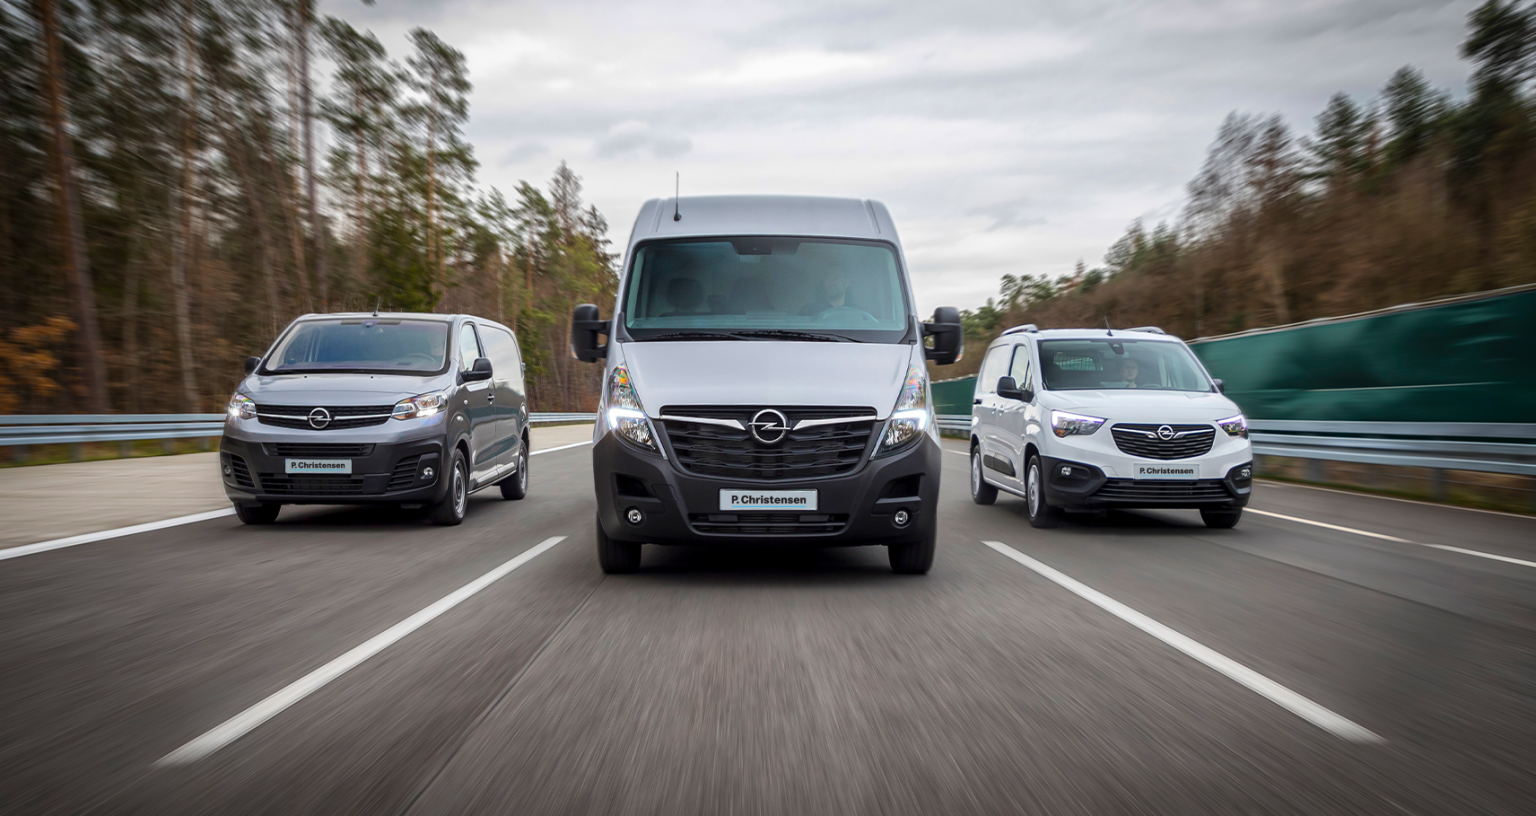 Opel varebiler